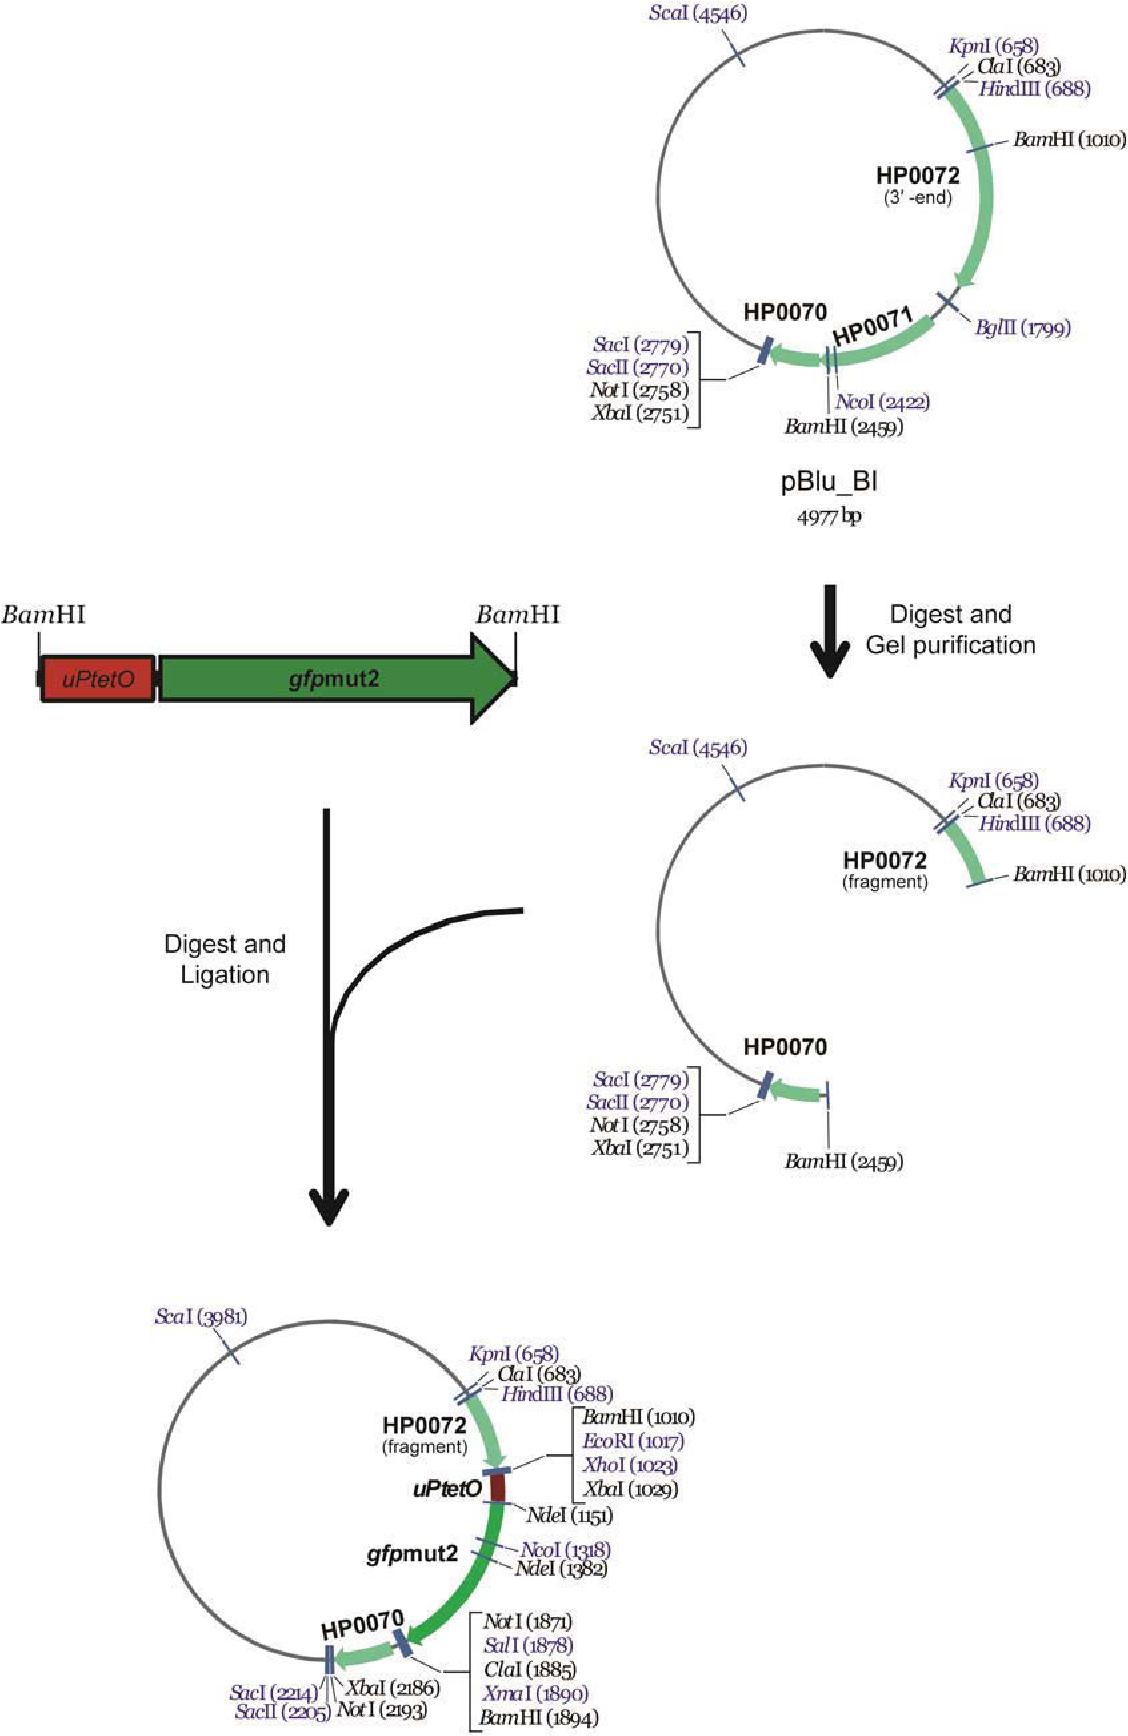 Figure 3-16 Construction of pBlu_uPtetO-GFP (pAD314-pAD316)